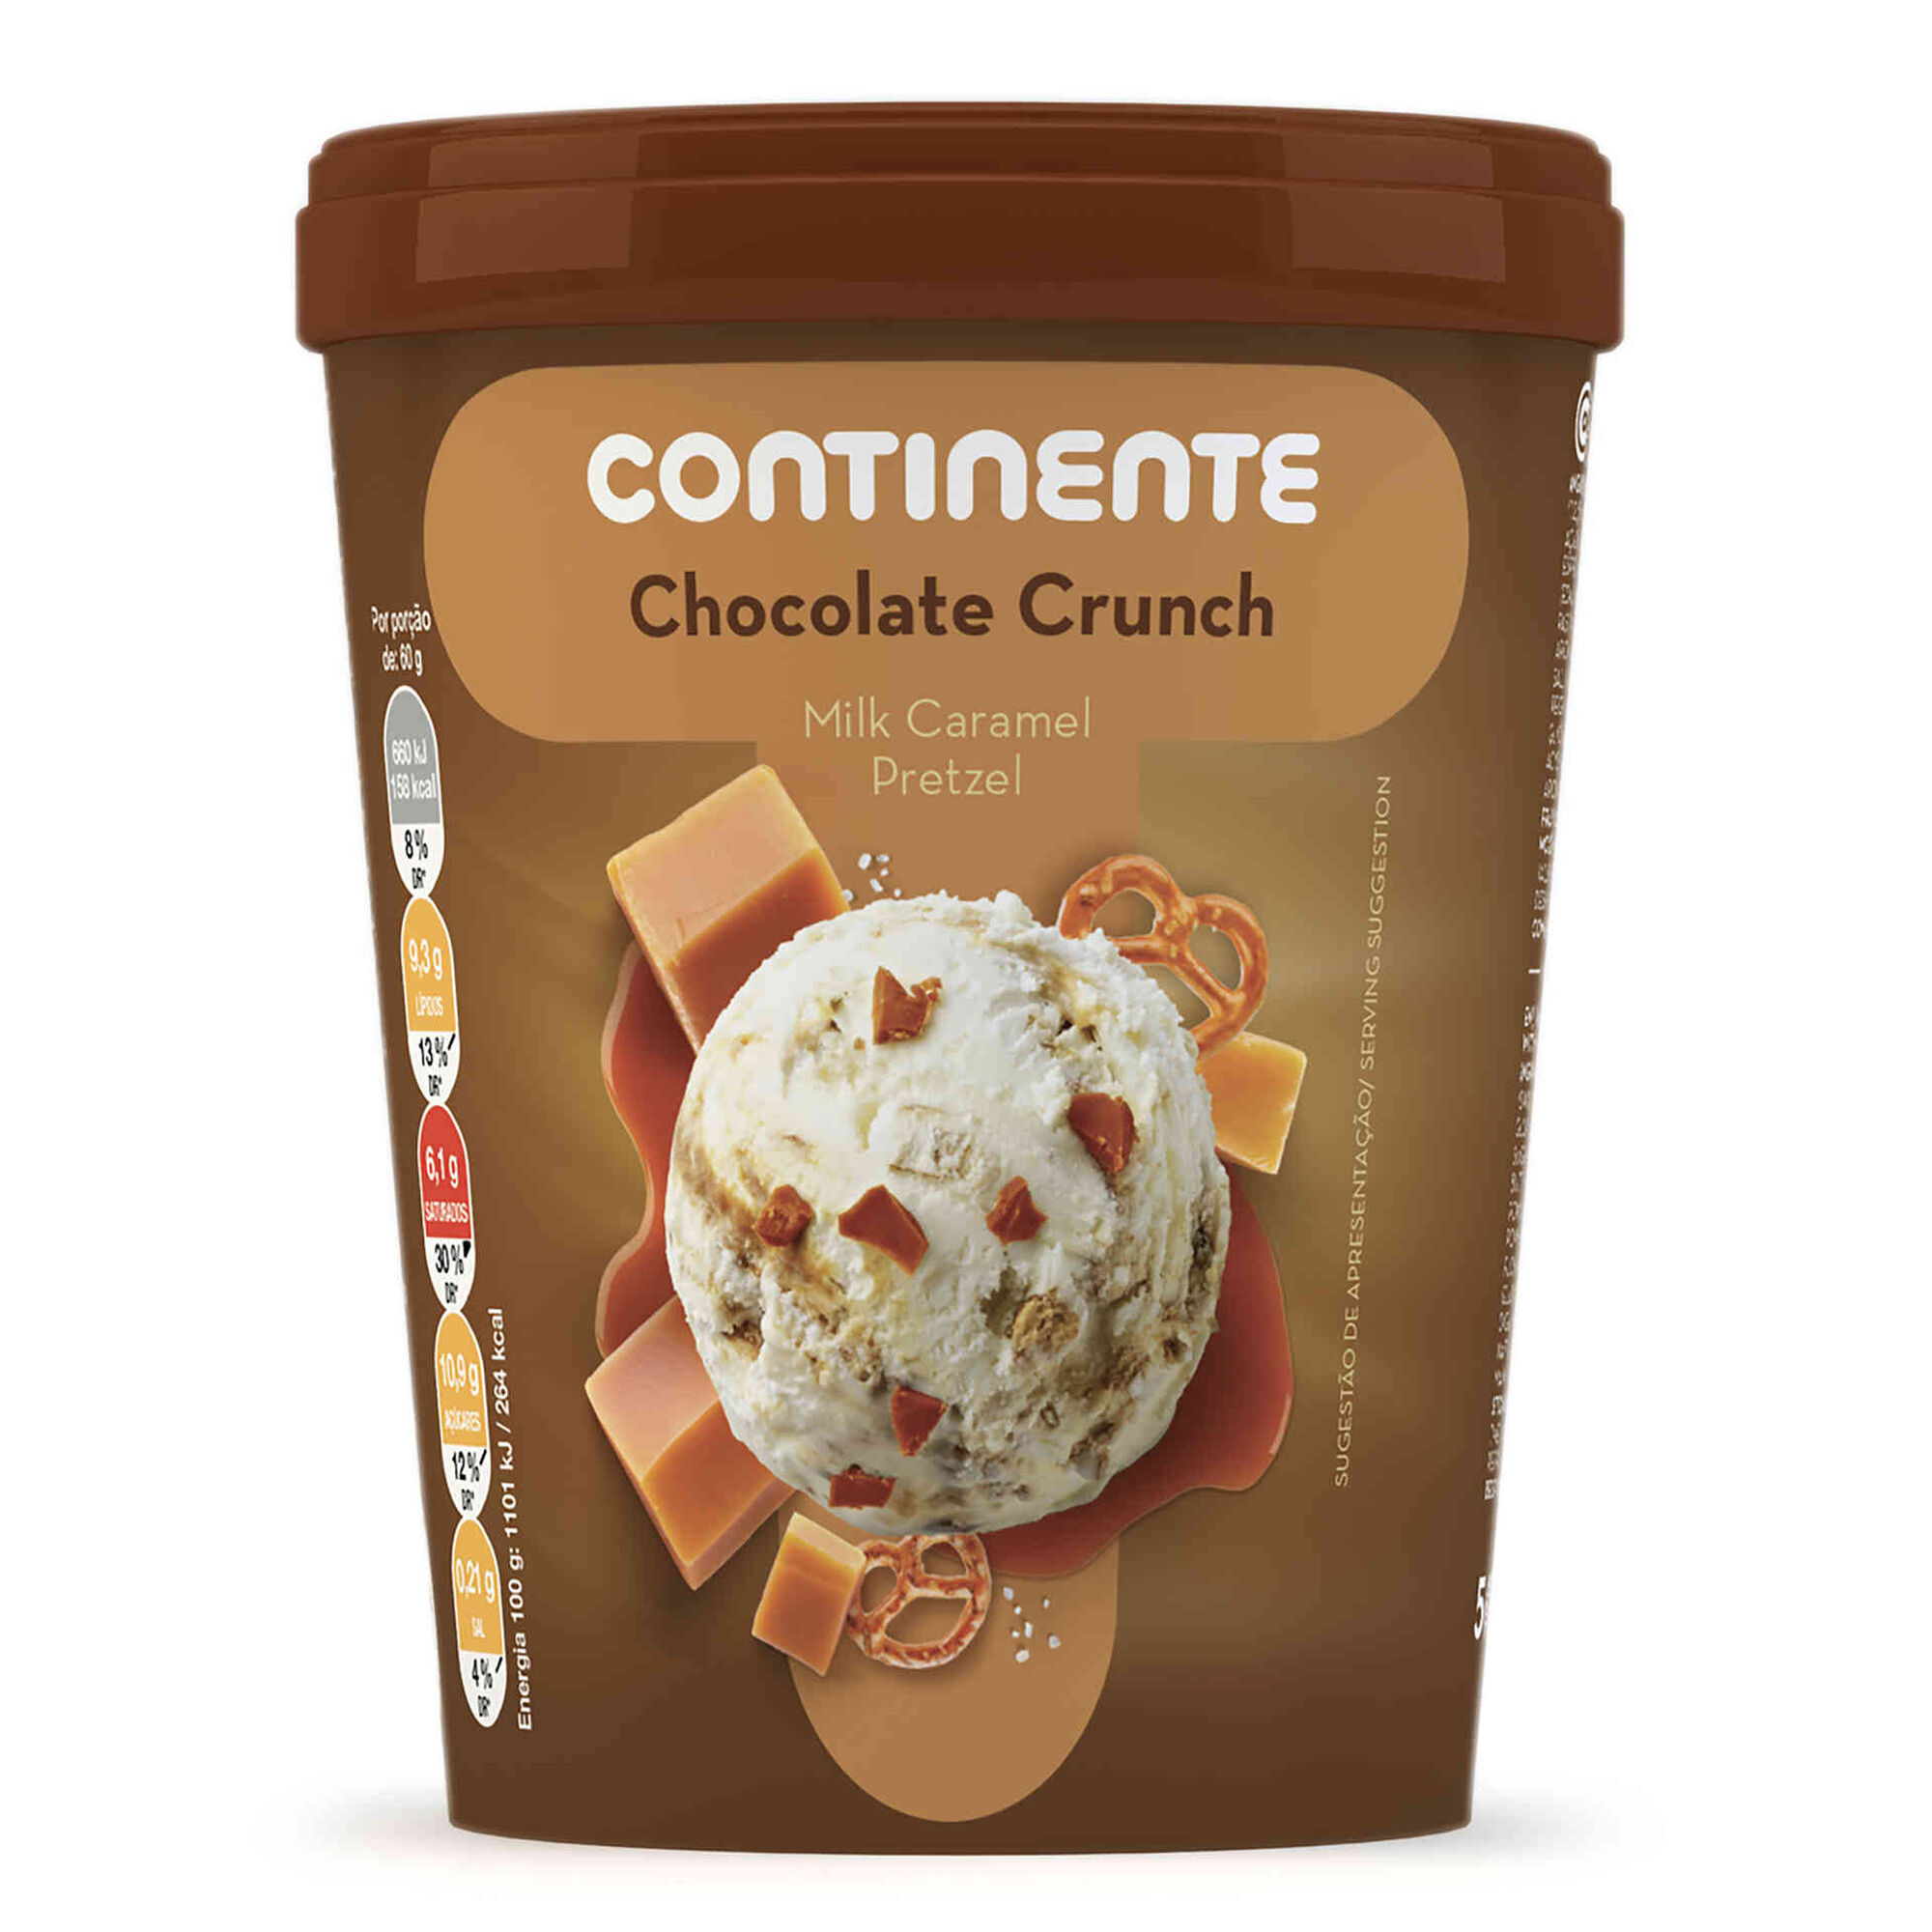 Gelado Chocolate Crunch Milk Caramel Pretzel